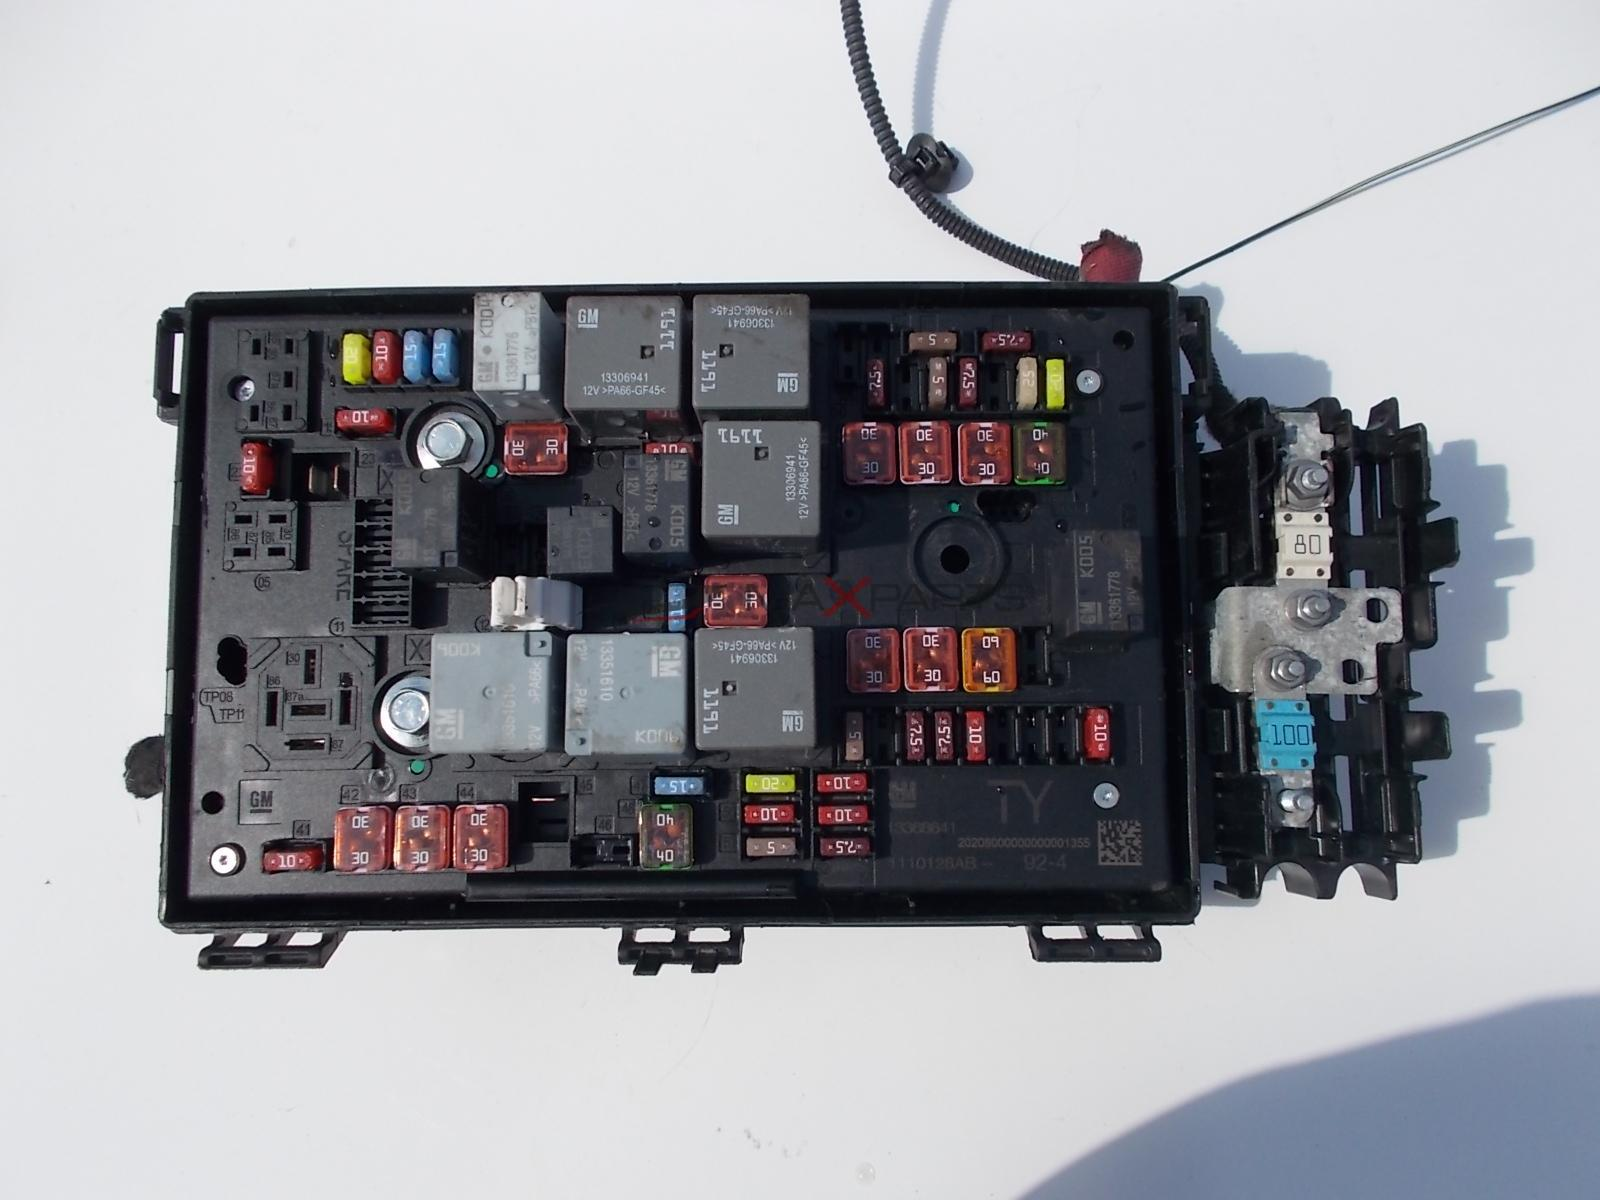 Fuse Box Astra Gsi | Wiring Diagram Astra Gsi Fuse Box Location on kadett gsi, corsa gsi, opel gsi, omega gsi, vectra gsi, cavalier gsi,